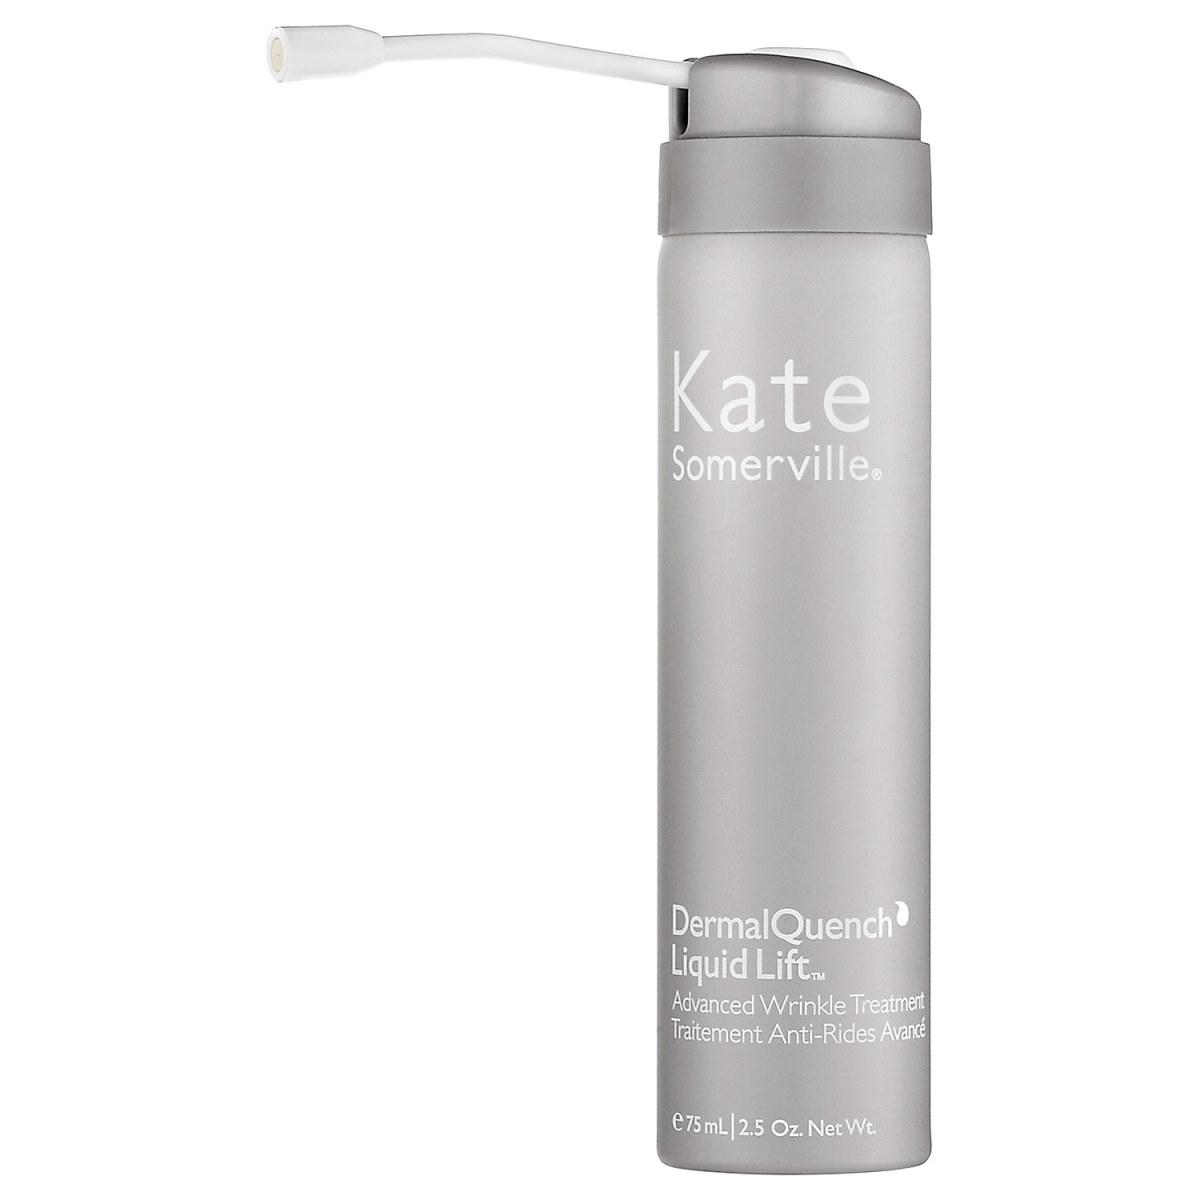 Kate Somerville DermalQuench Liquid Lift Advanced Wrinkle Reducer